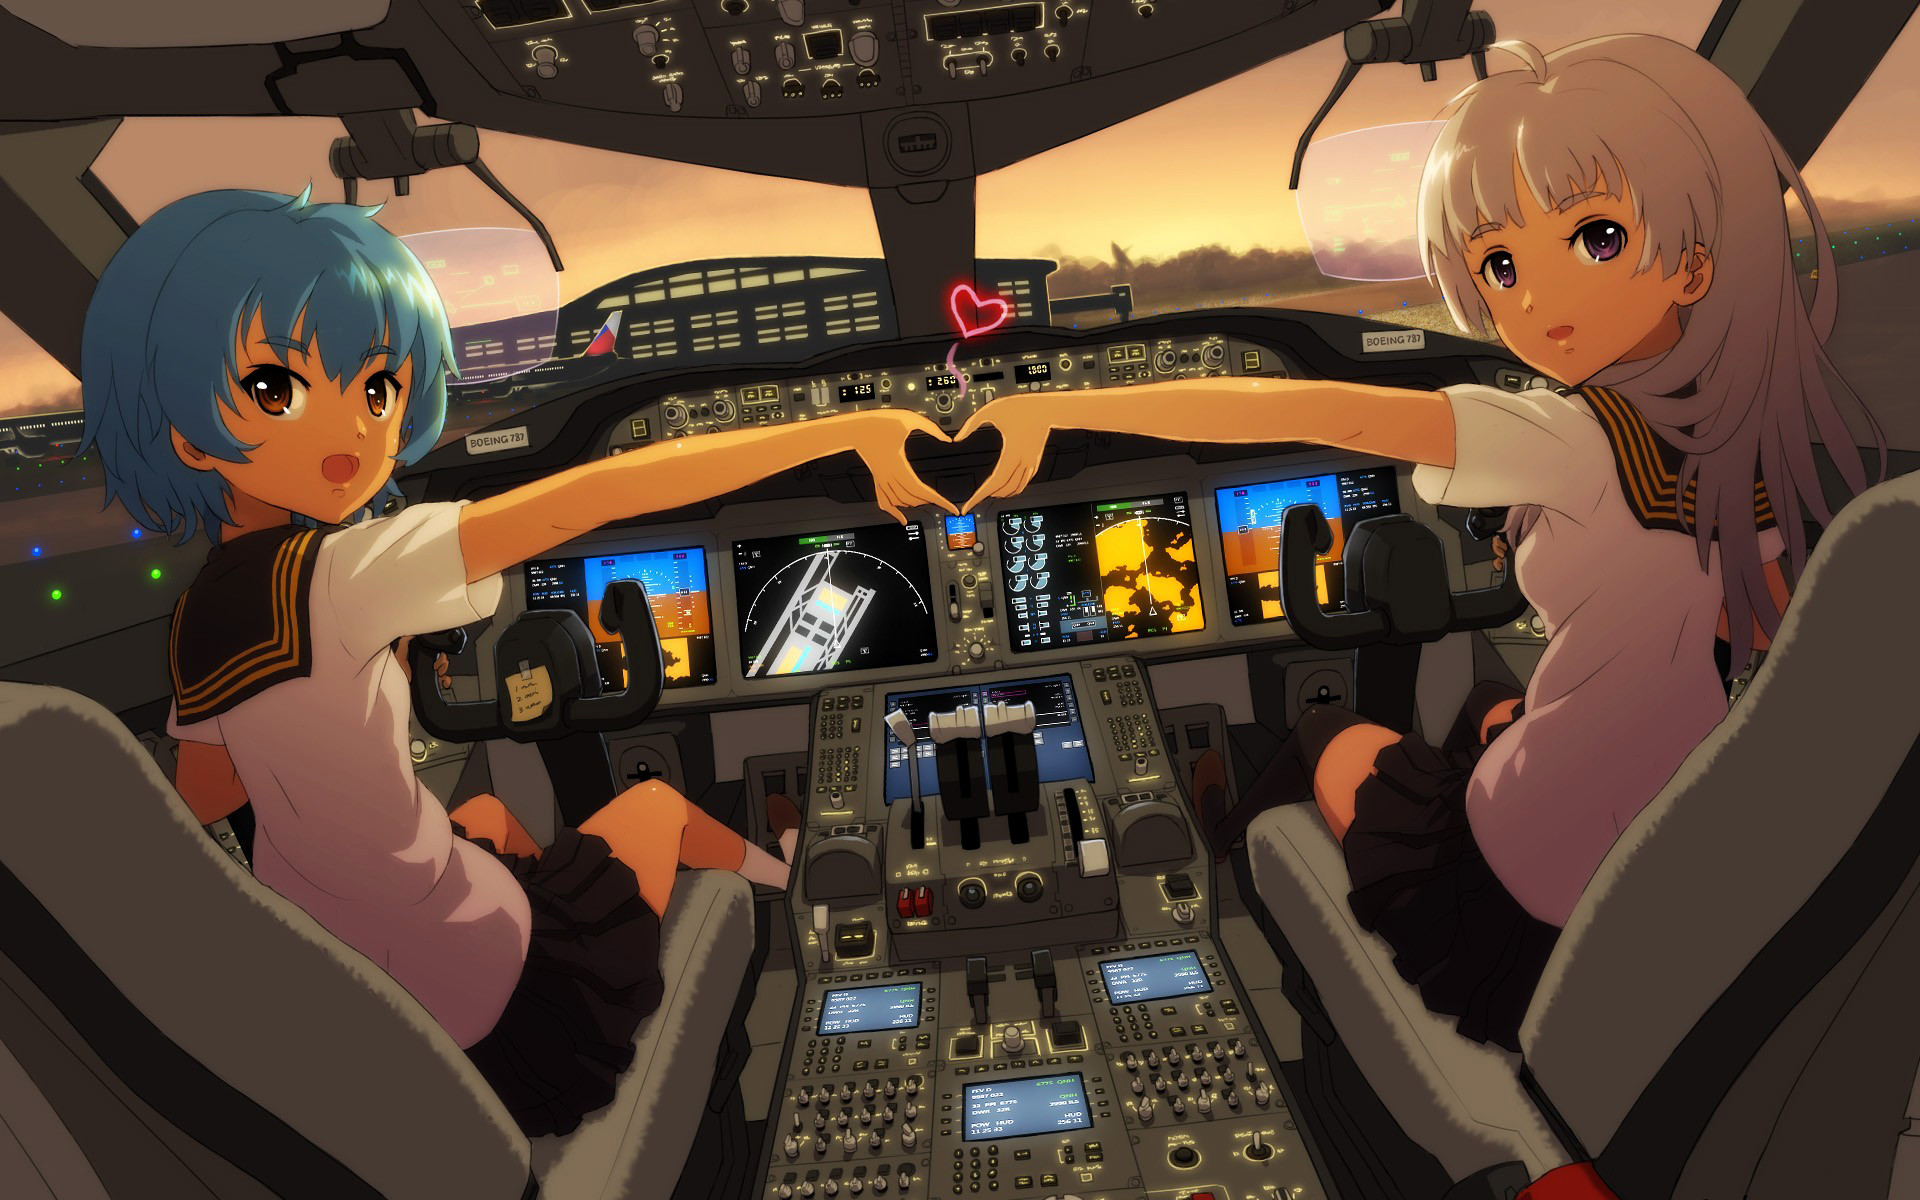 Ghibli Wallpaper Iphone Airplane Cockpit Wallpaper Hd 73 Images